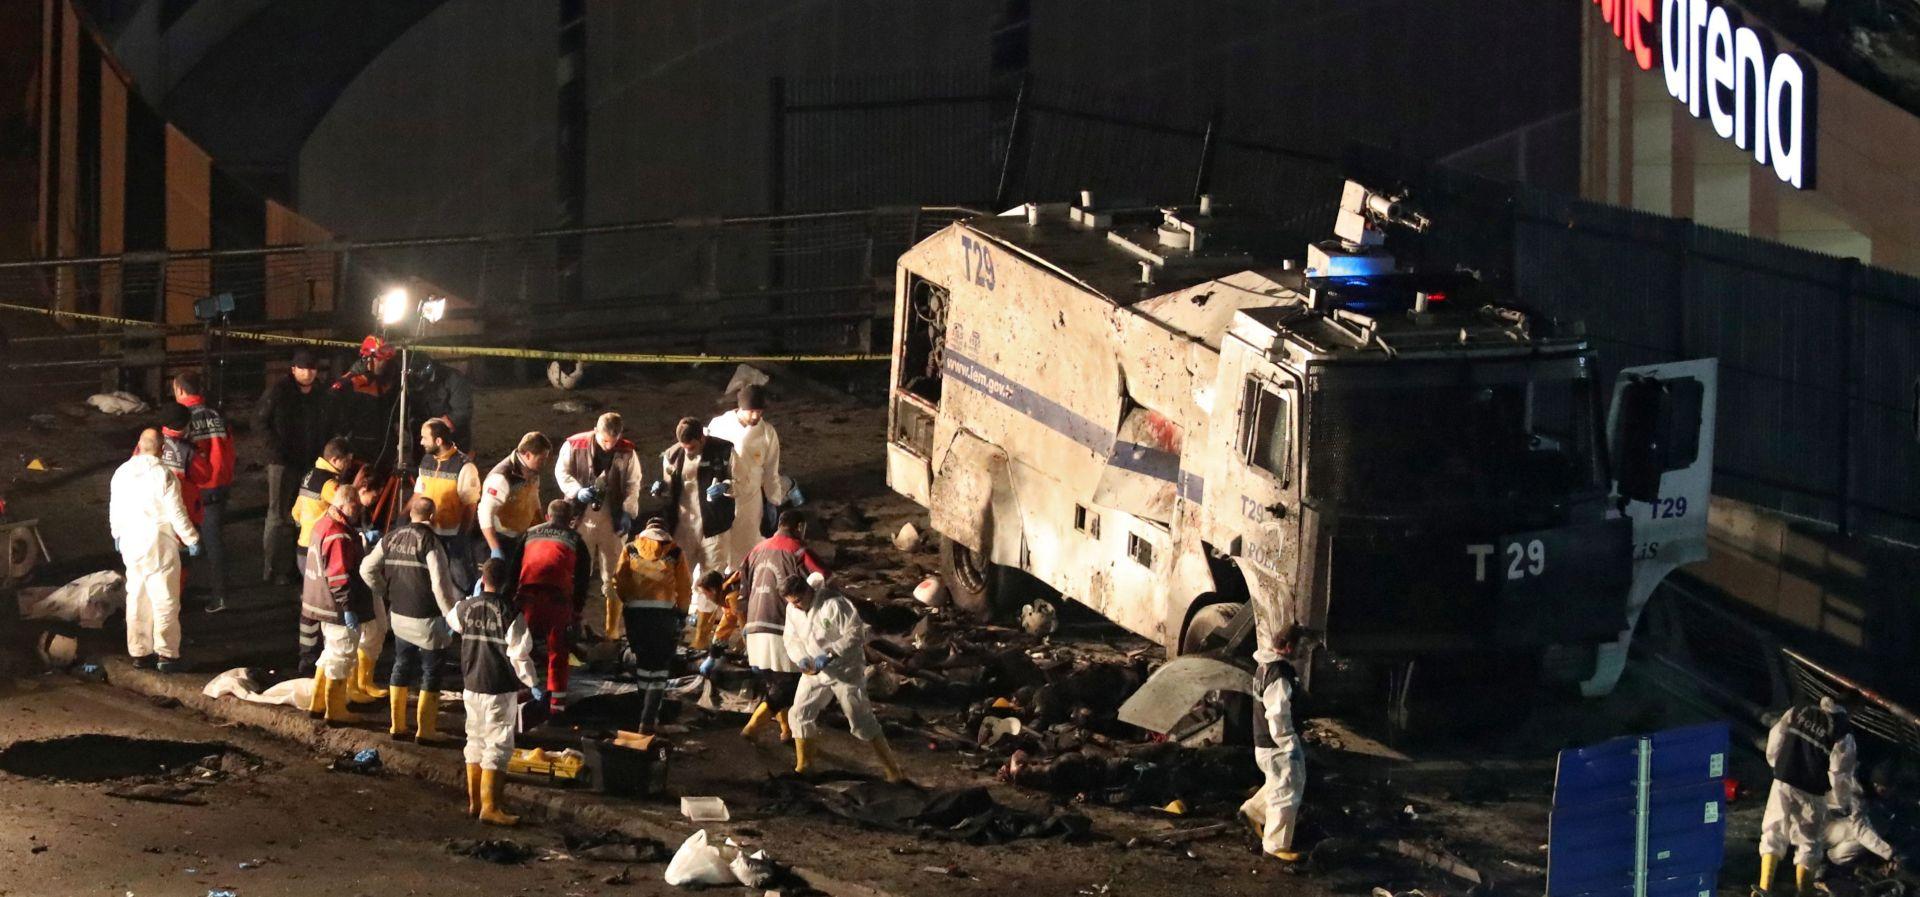 Kurdska militantna skupina TAK preuzela odgovornost za napade u Istanbulu